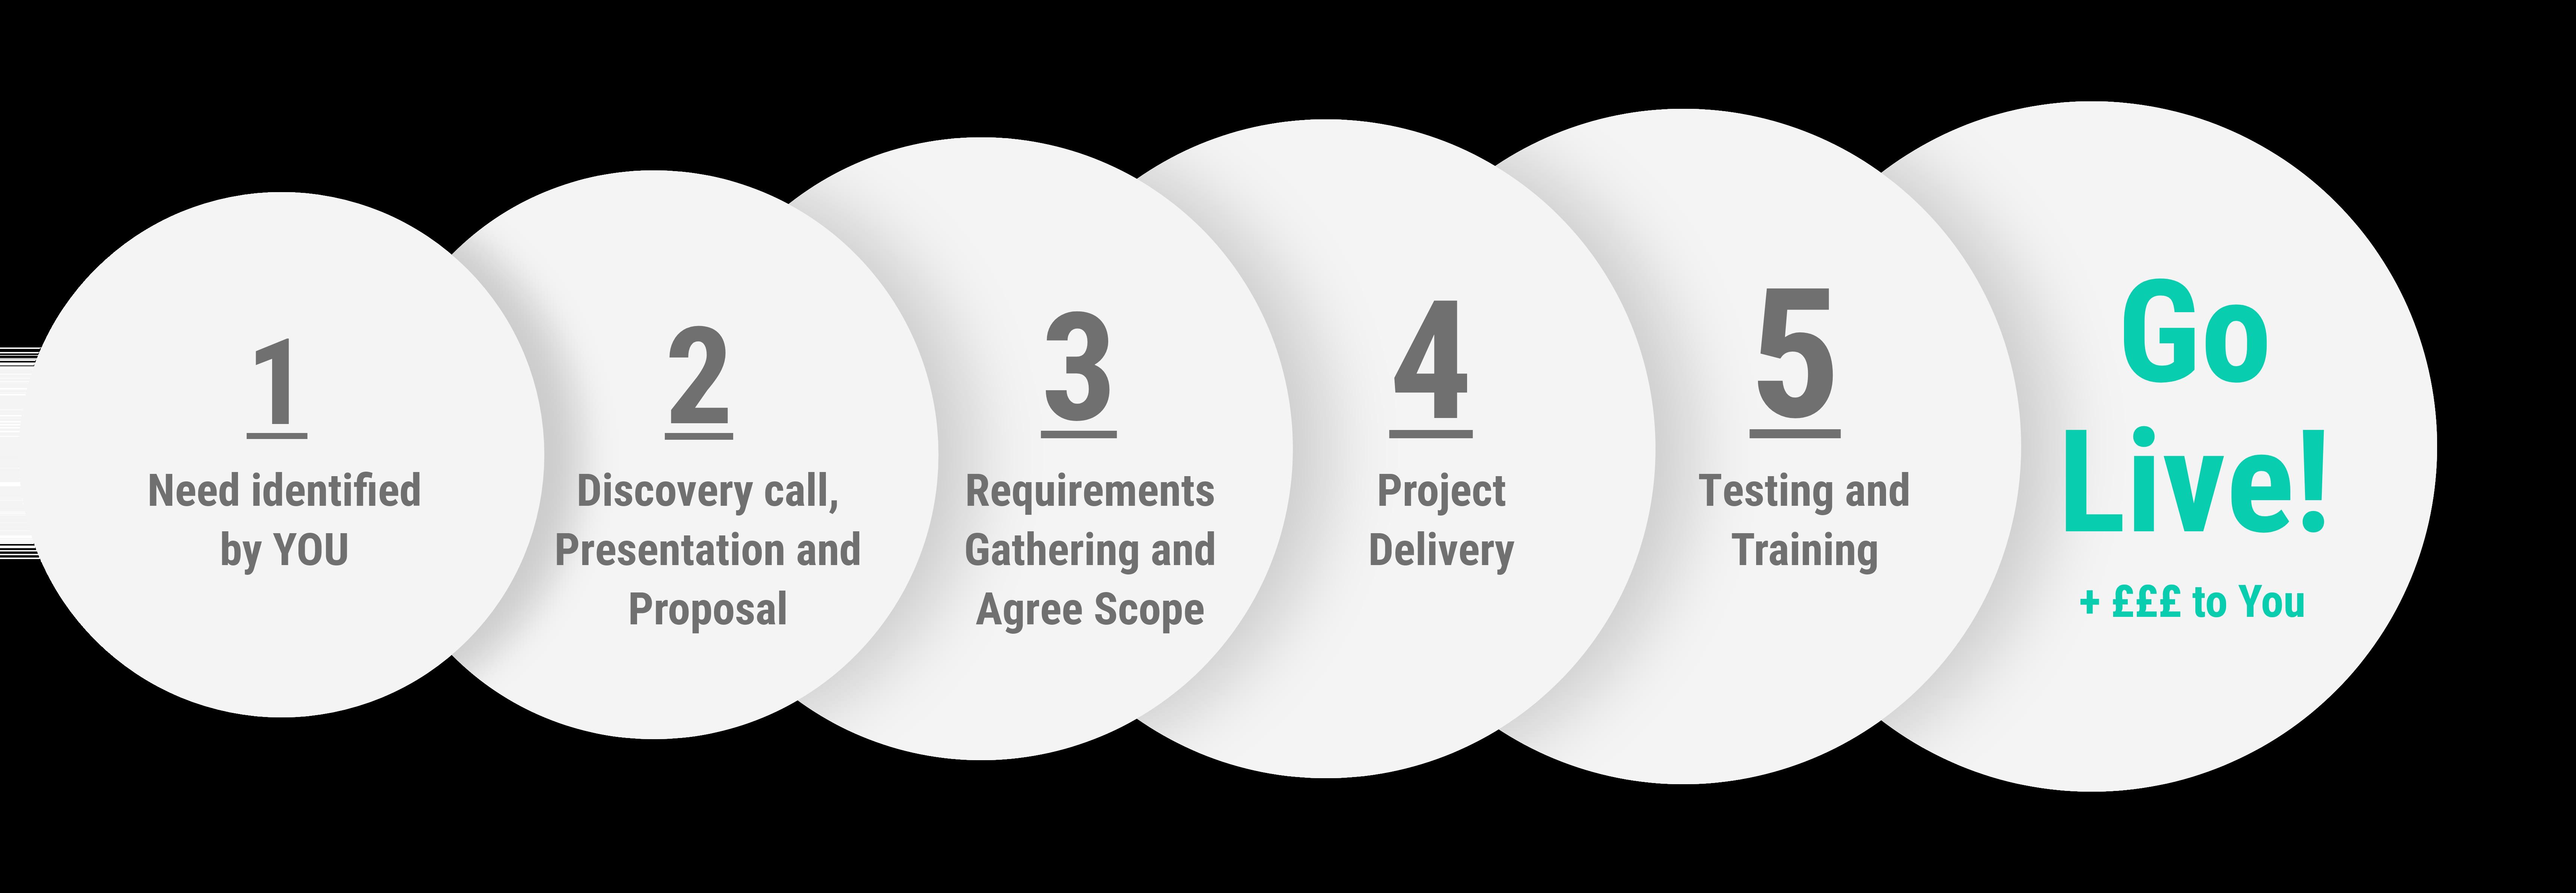 partner-project-approach 6 steps.